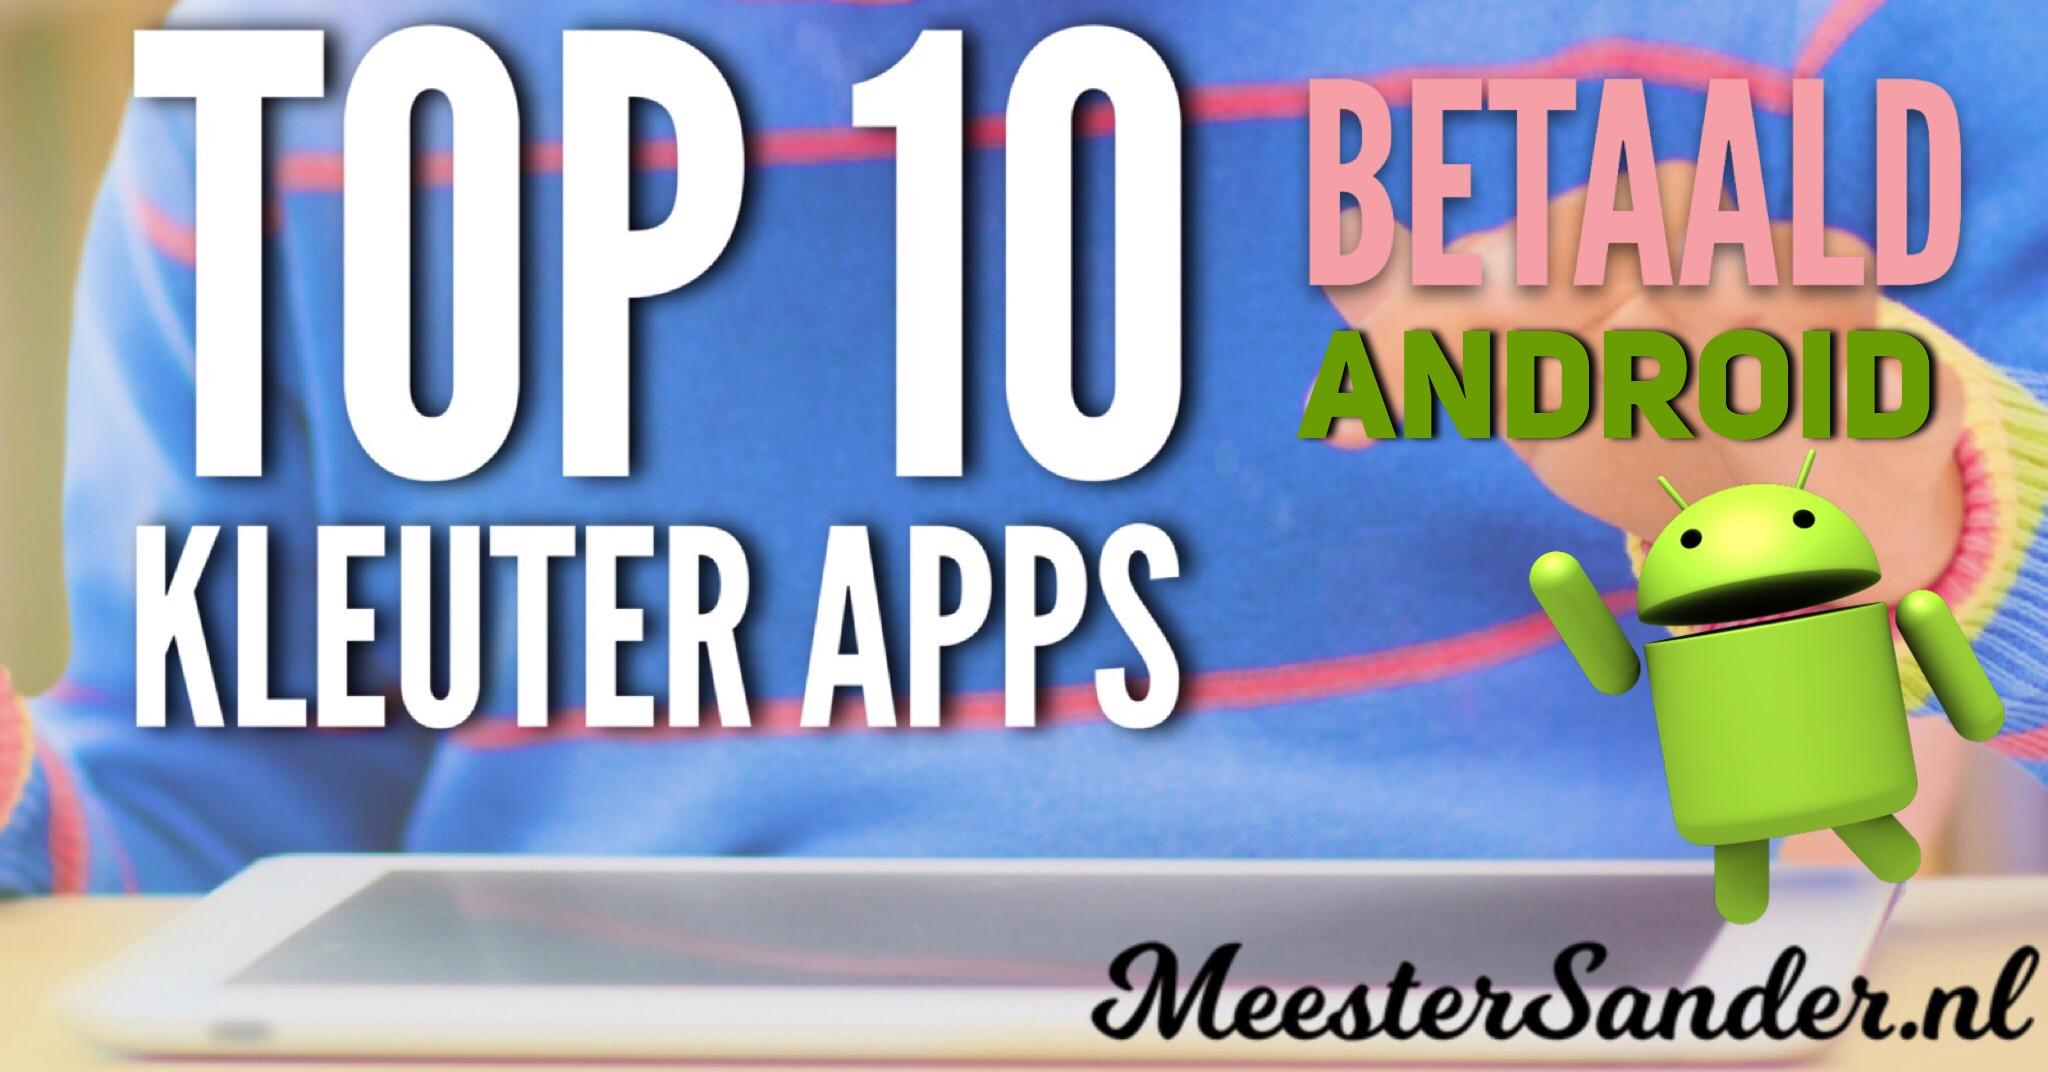 Top 10 kleuter apps Android betaald